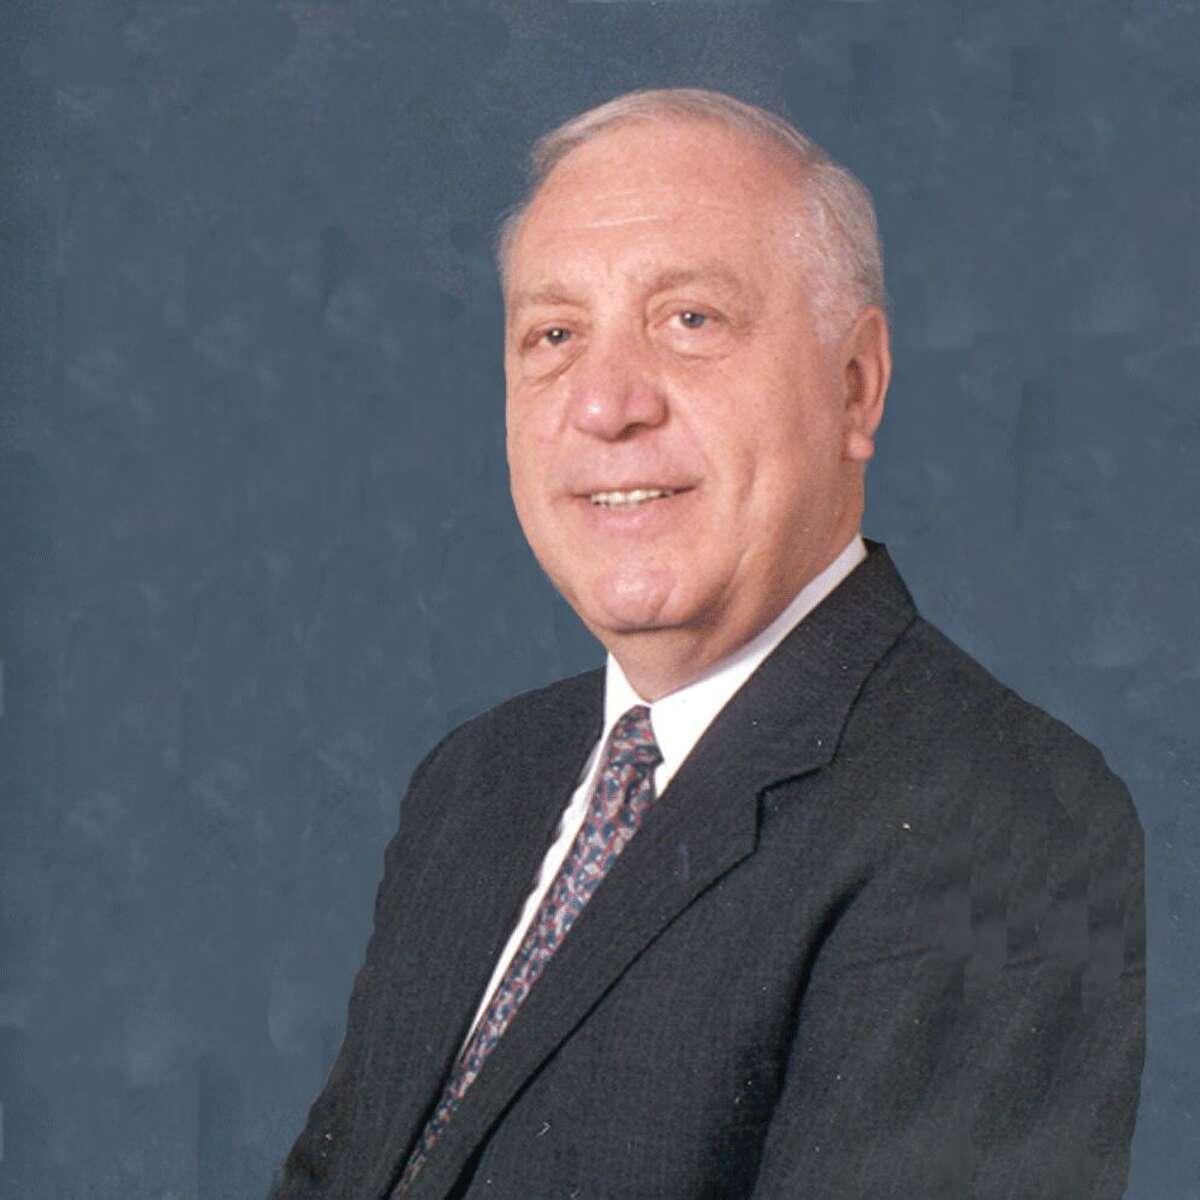 State Rep. Joseph Serra of Middletown